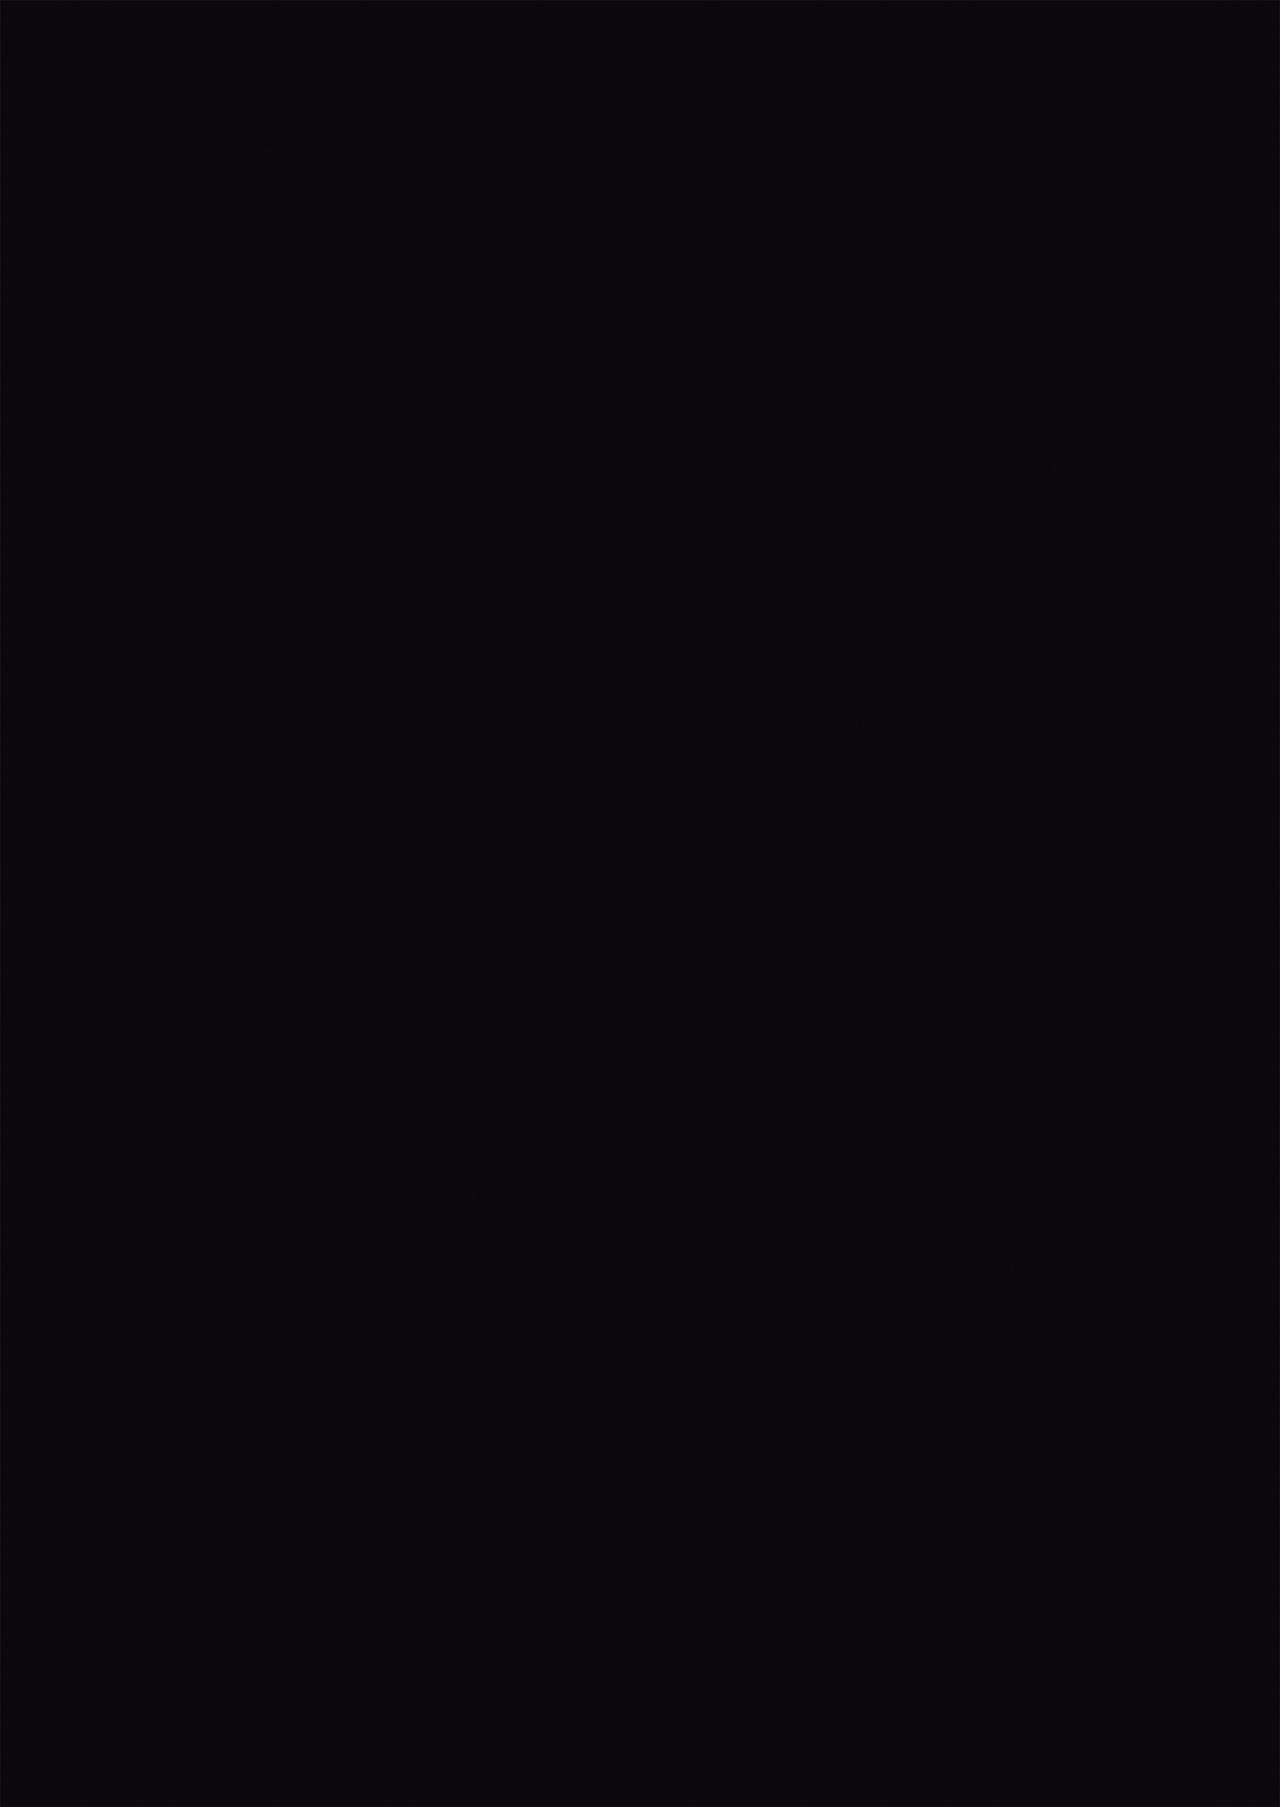 [Remora Works (isaki)] FUTACOLO CO -INHERITANCE- VOL. 004 + Bonus 1